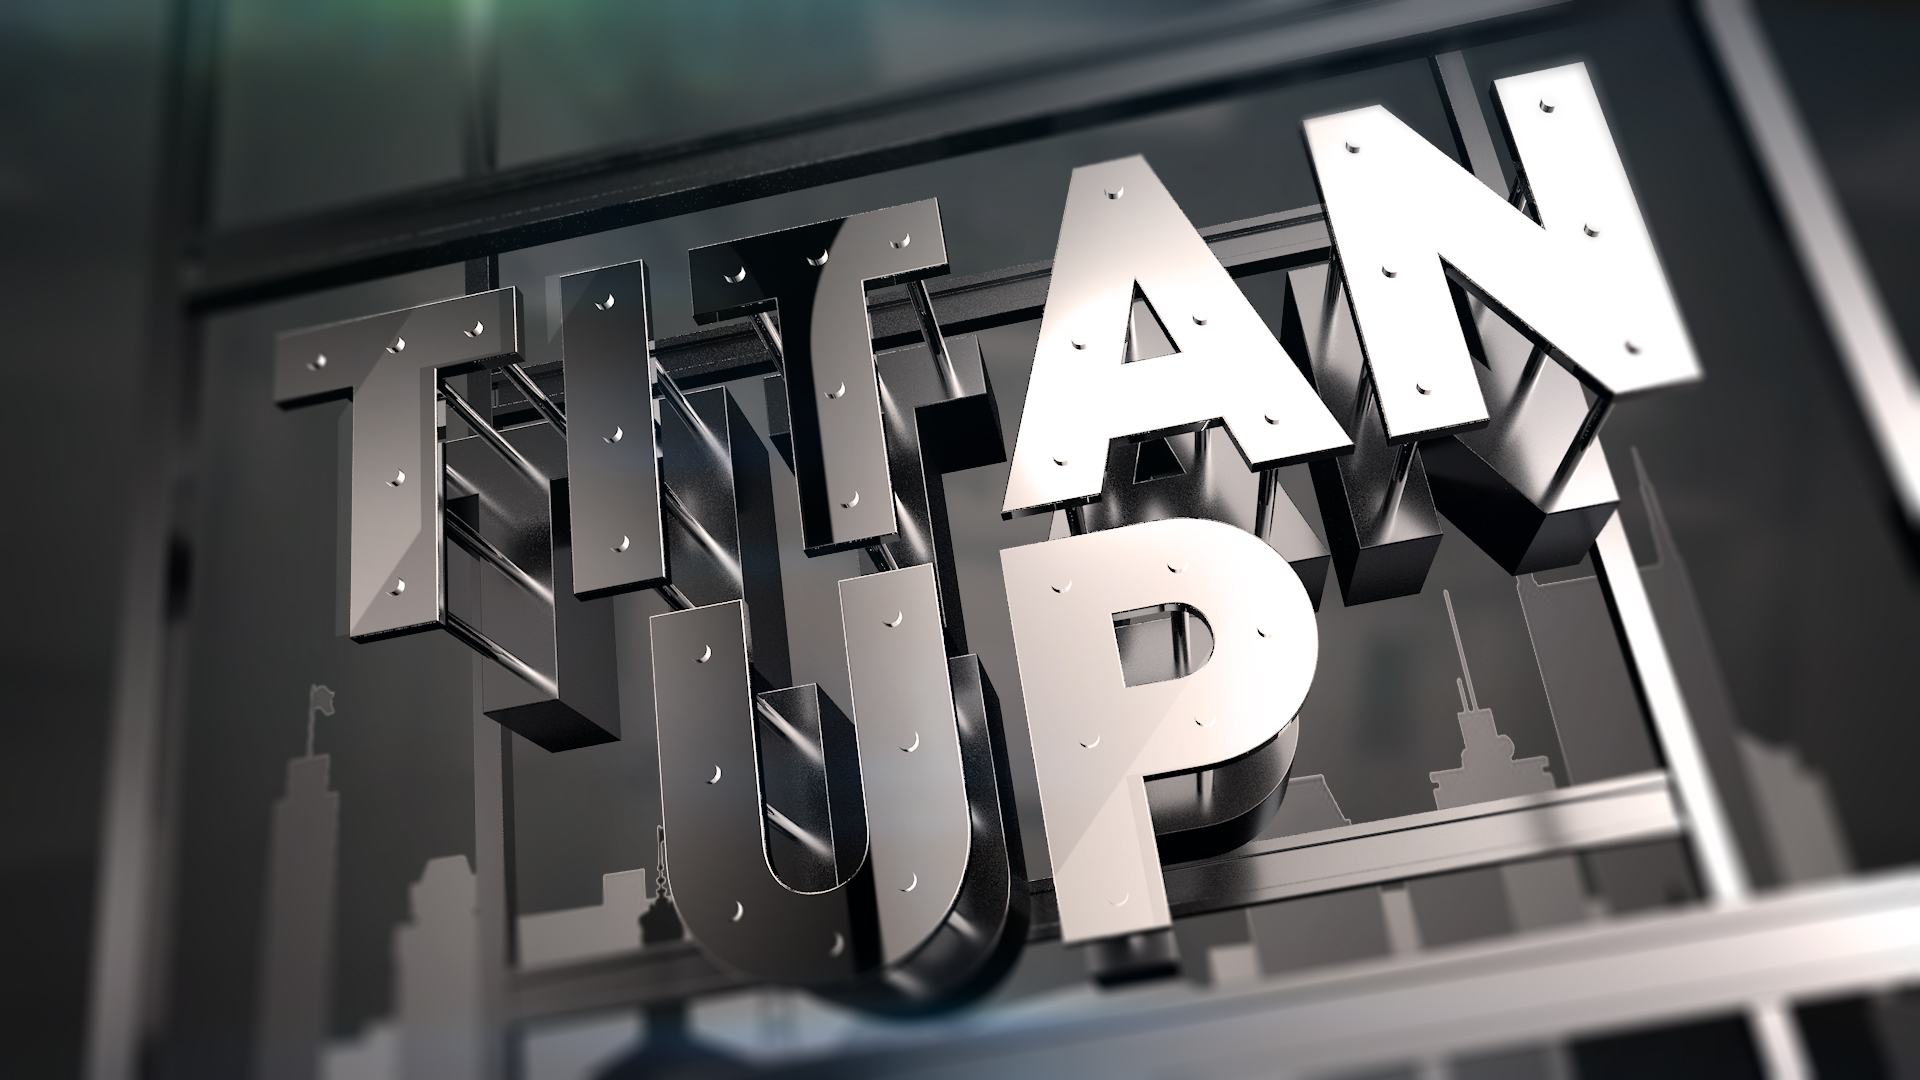 Titans_Concept_LookFrame_003.jpg